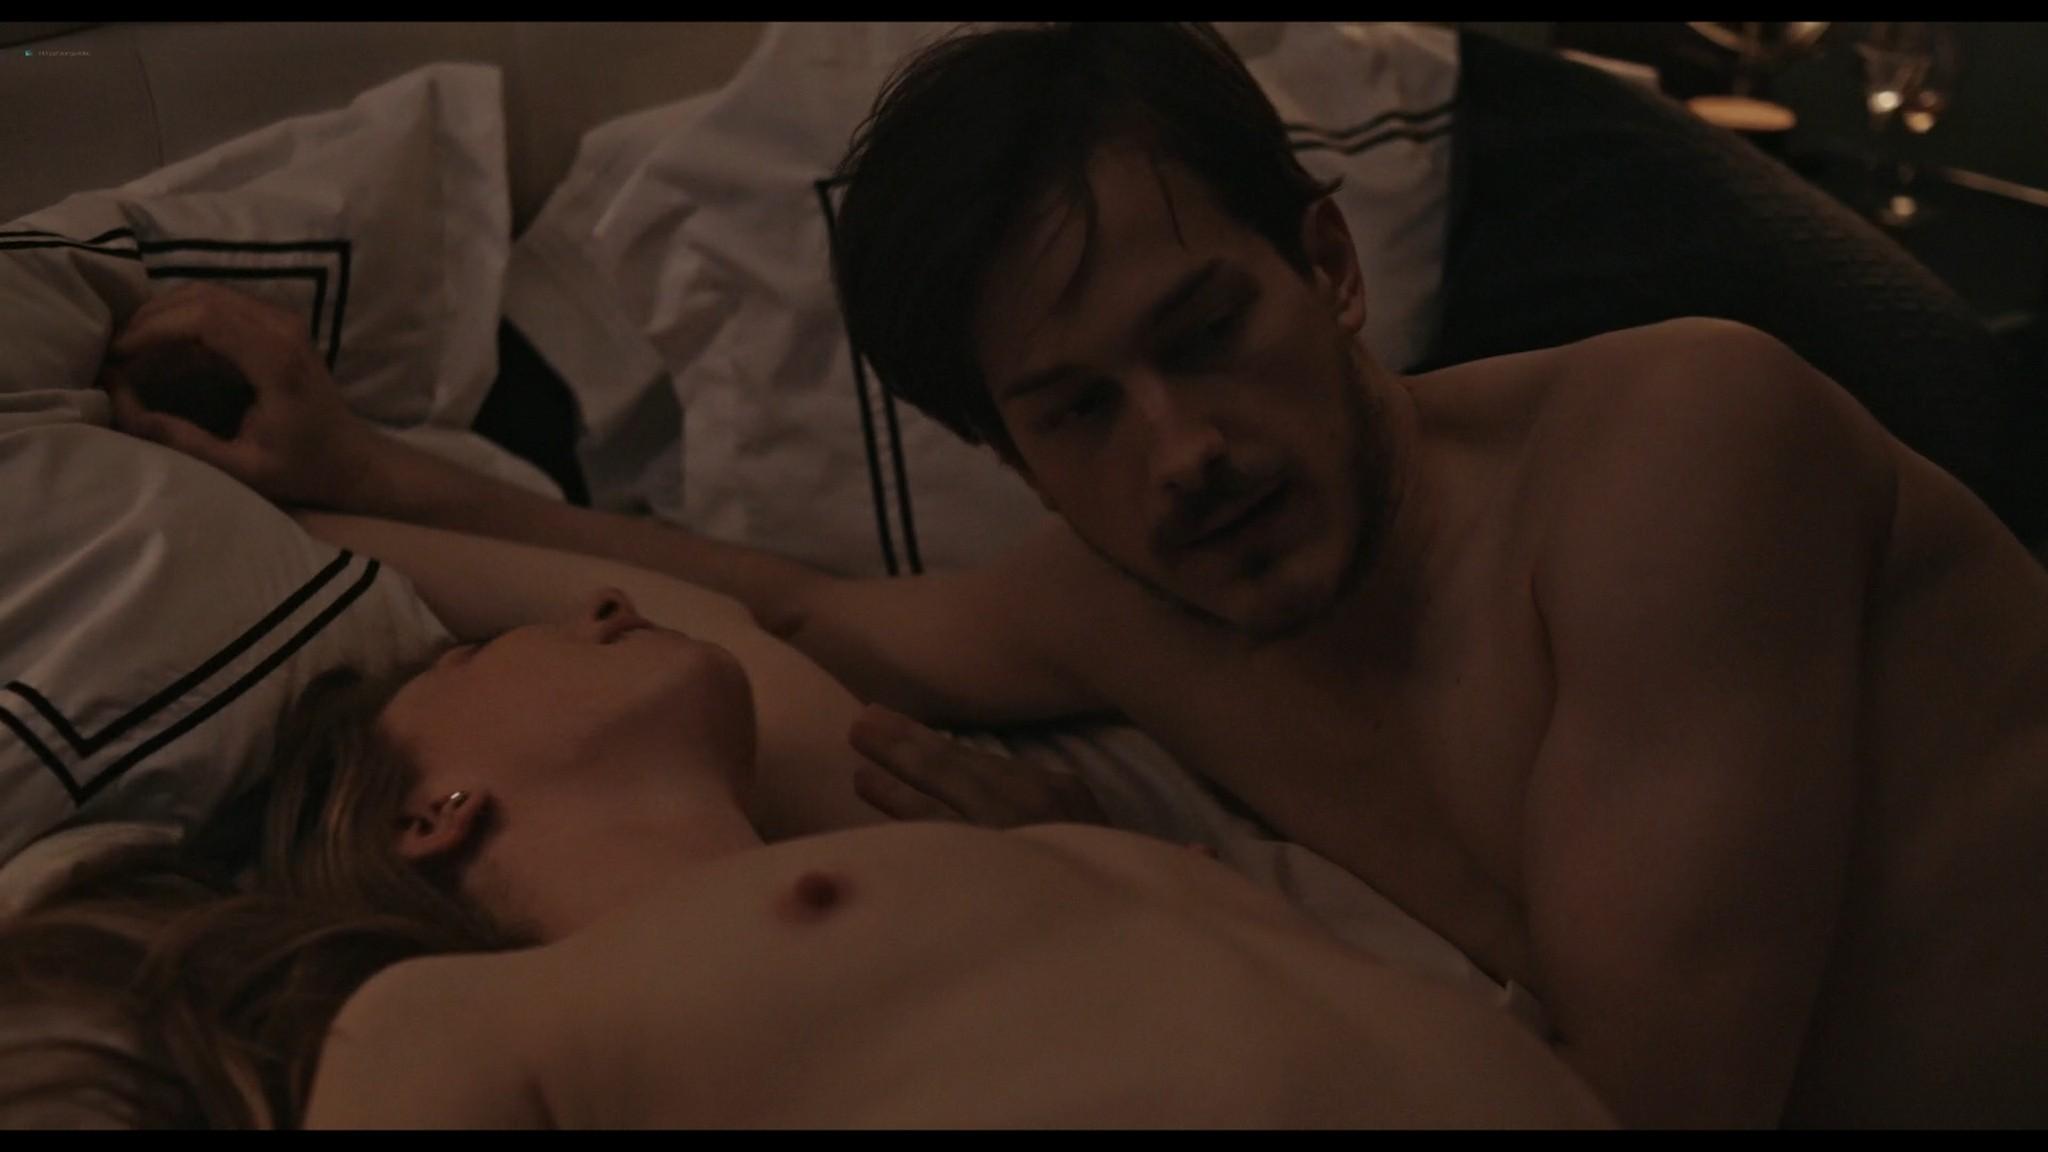 Zina Zinchenko nude sex Bobbi Jene Smith nude sex too and explicit Aviva 2020 HD 1080p Web 15